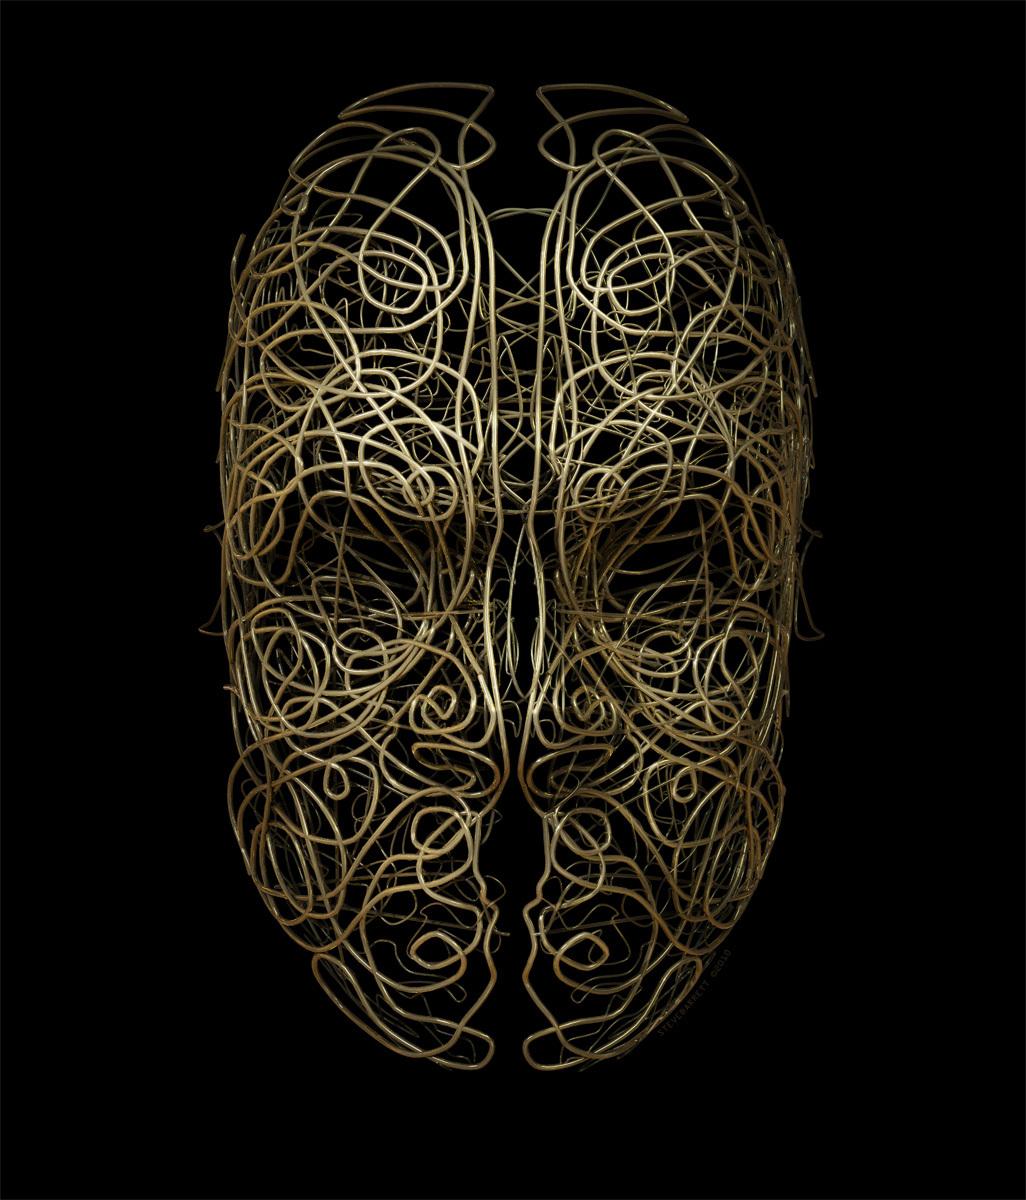 Stevebarrett mask iii 1 3273dd13 bi6y